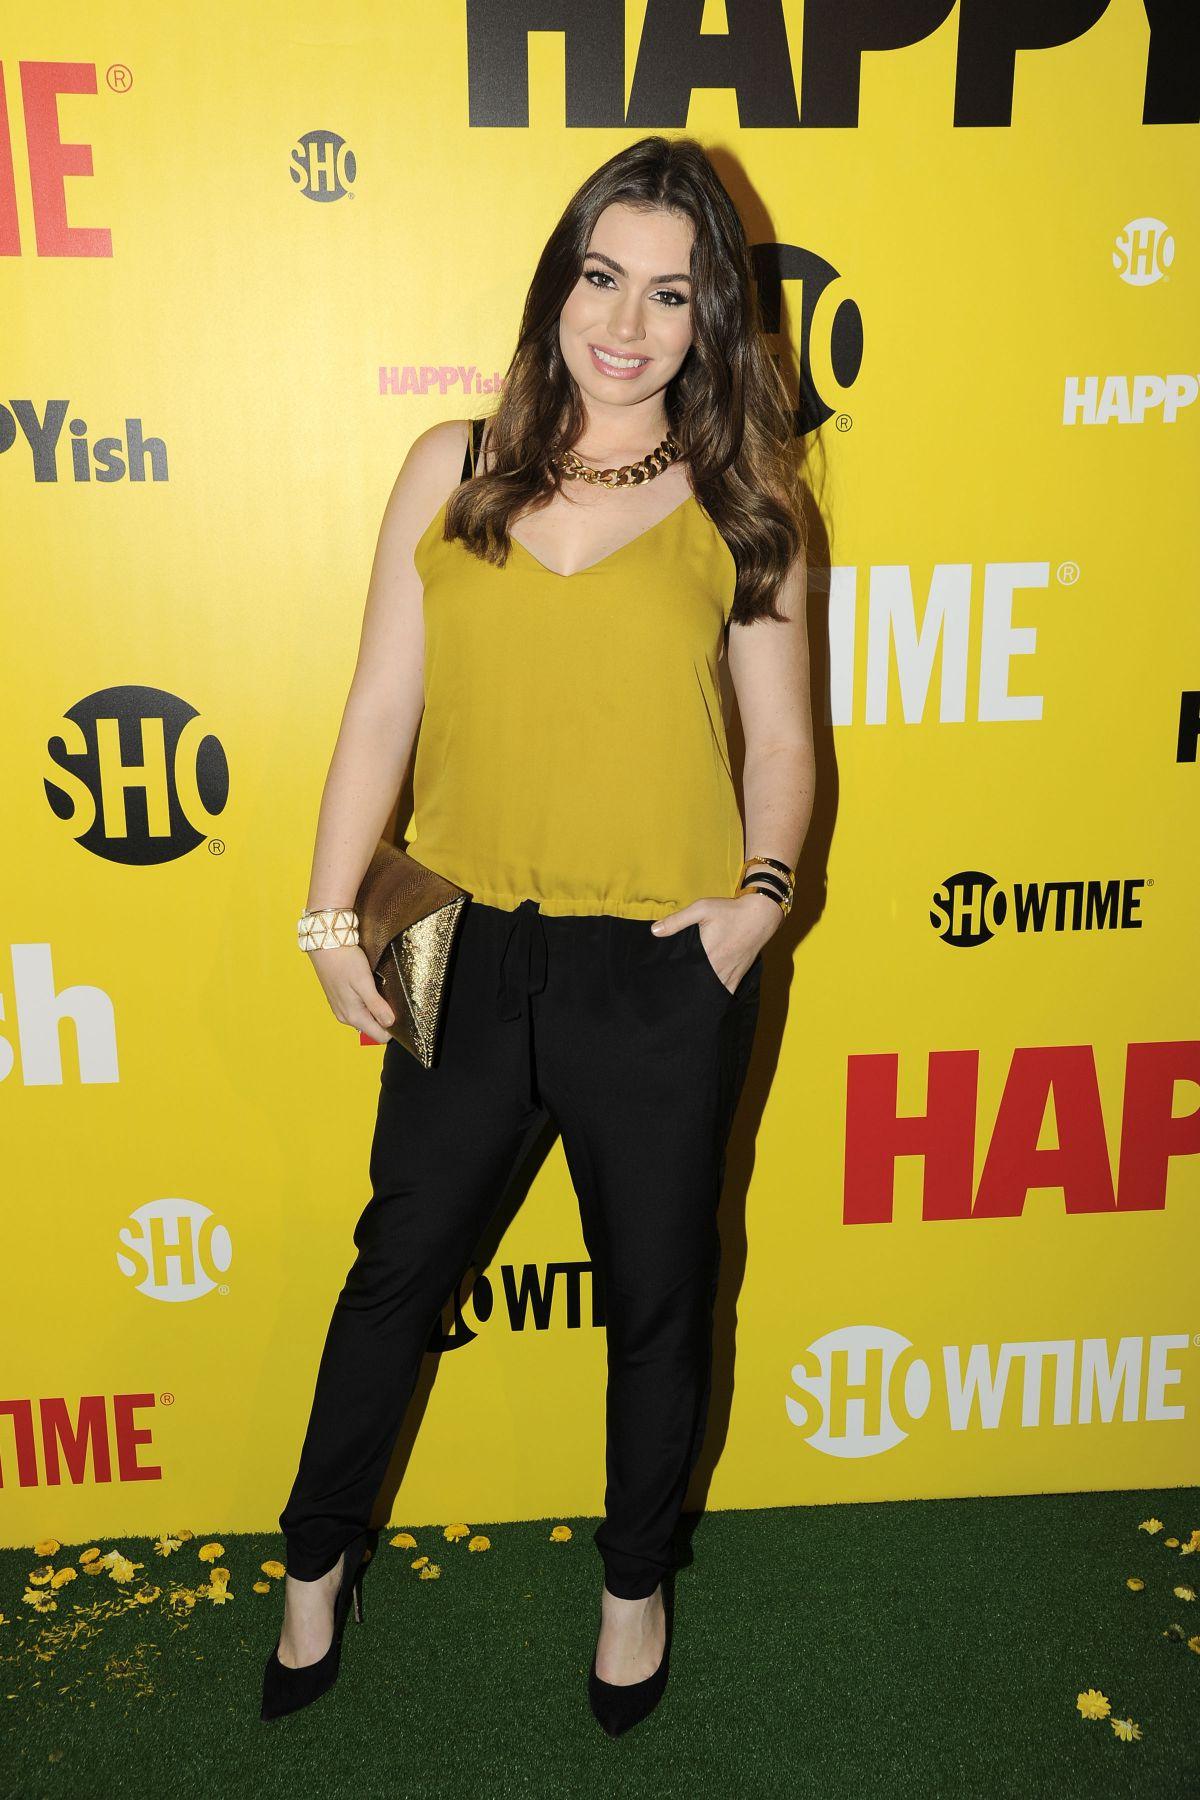 SOPHIE SIMMONS at Happyish Series Premiere in New York